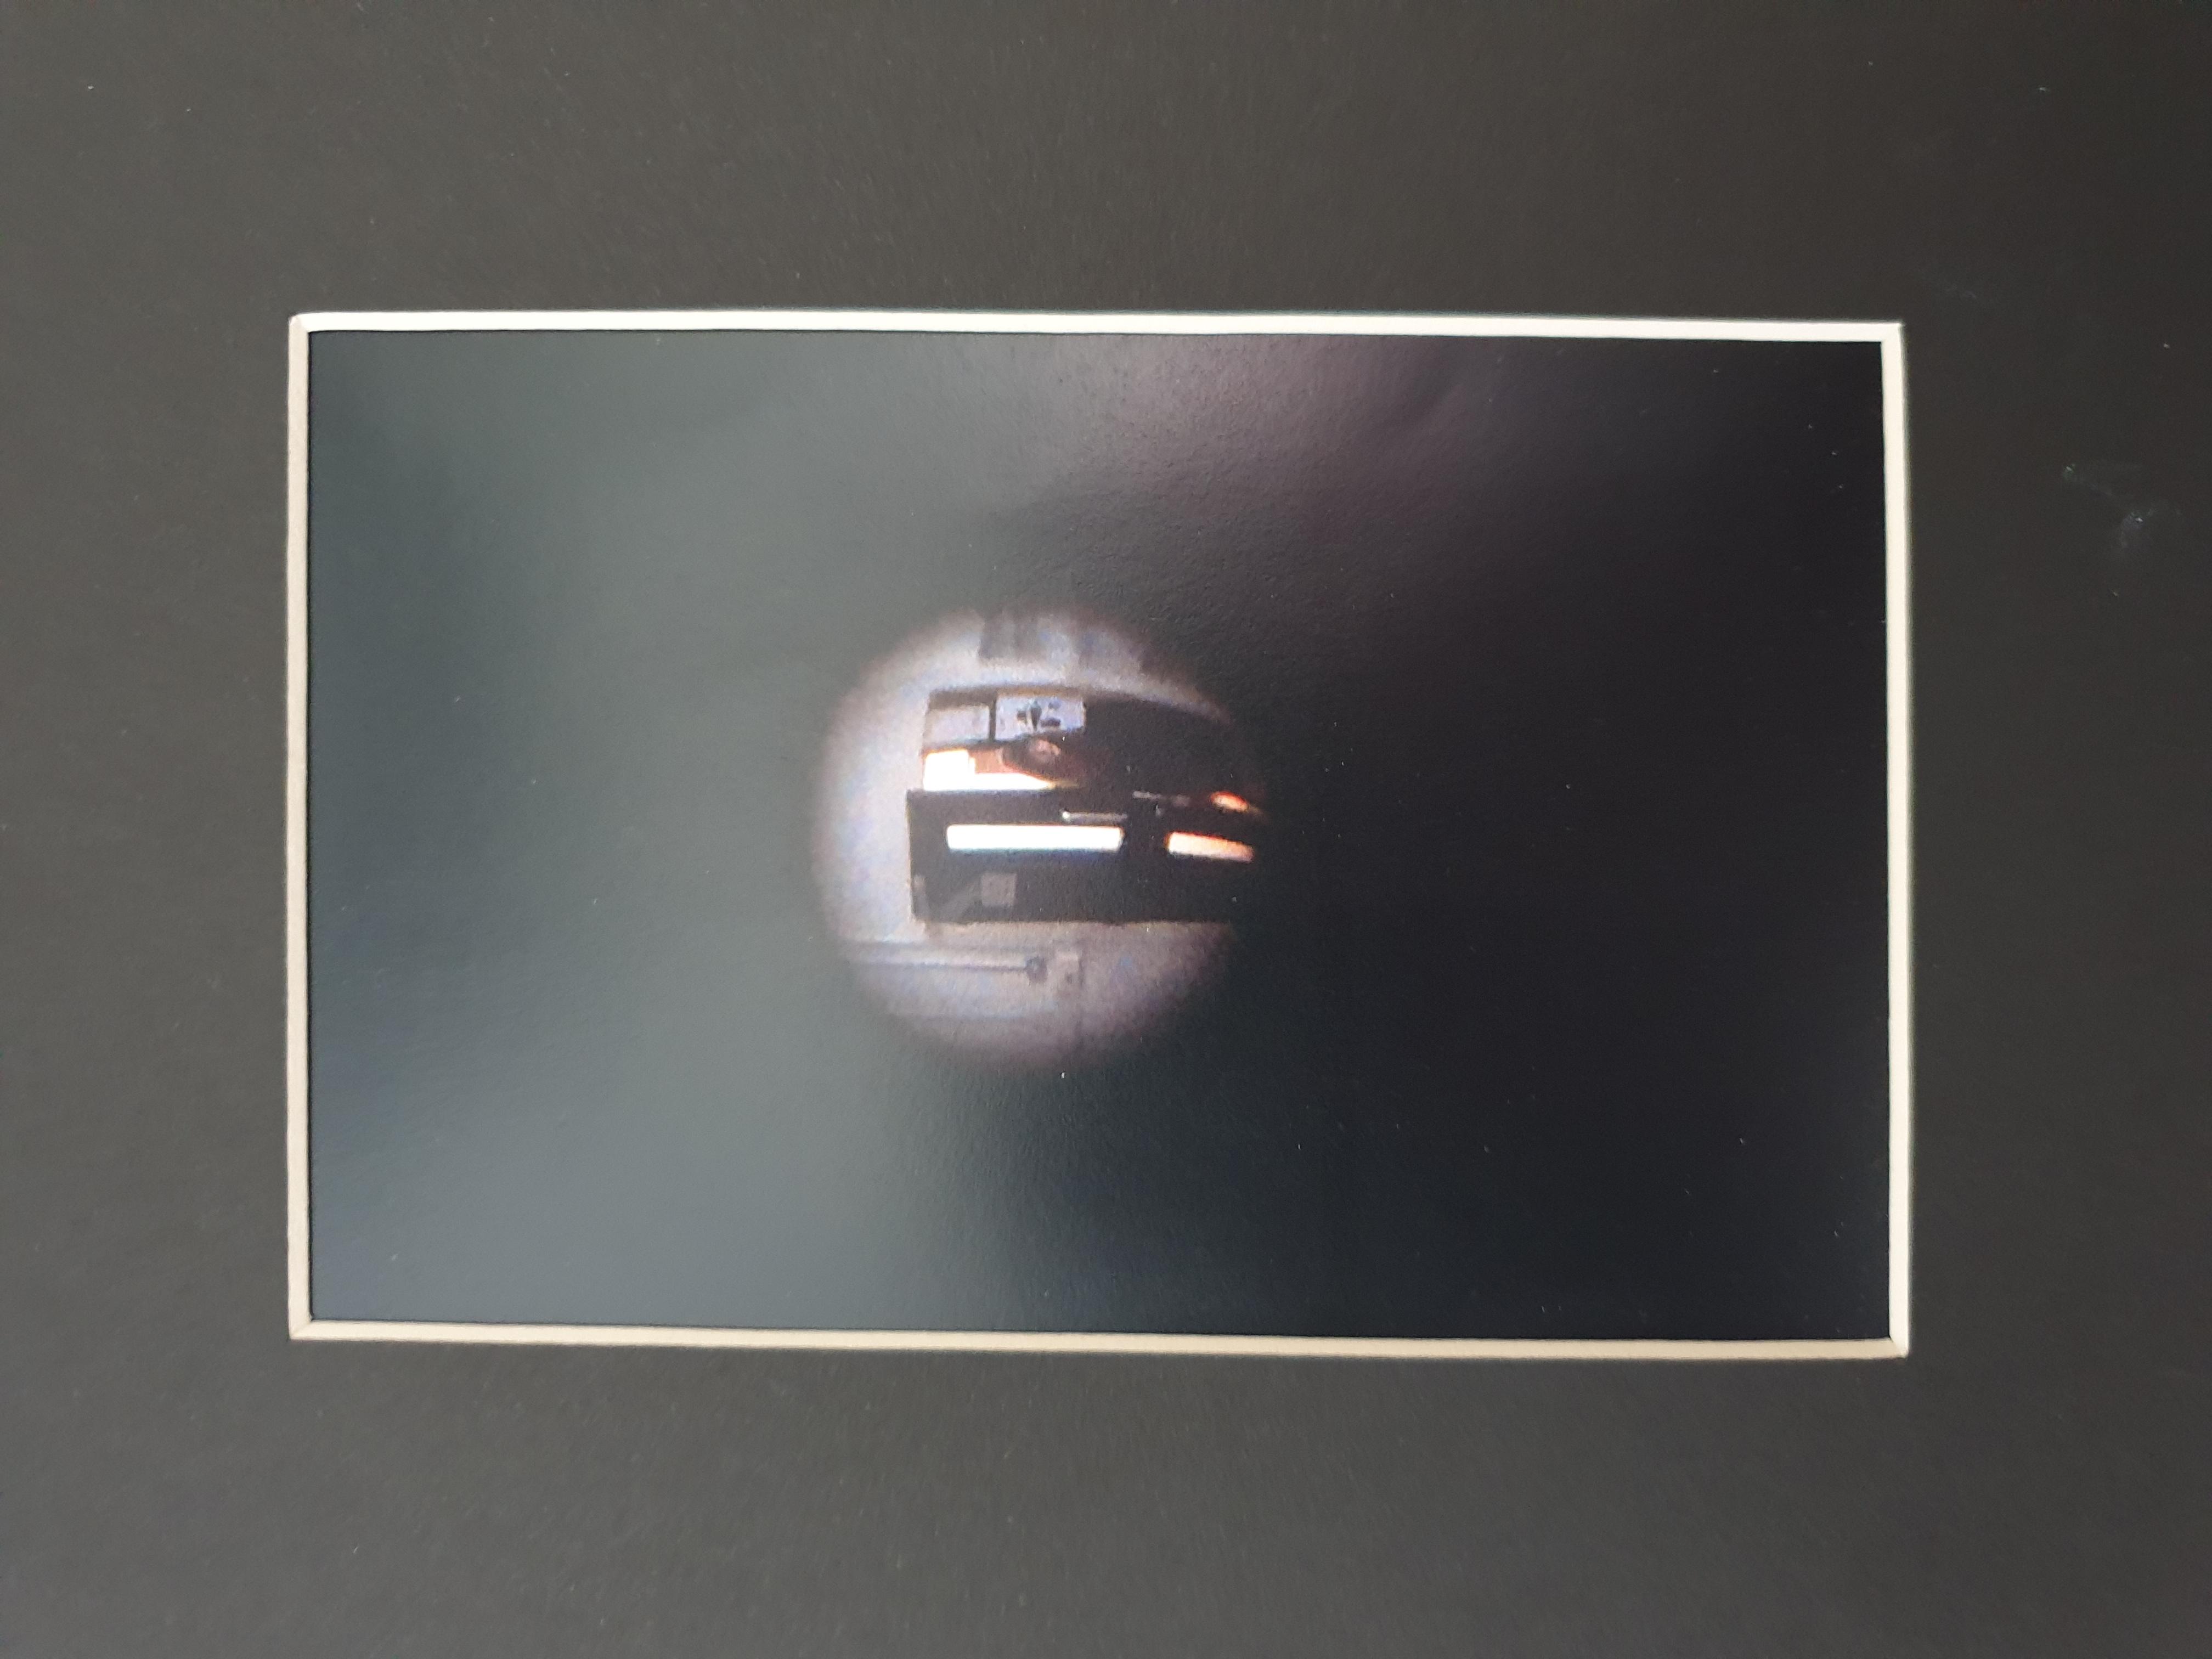 Through the Peephole Photograph 2 (2013)